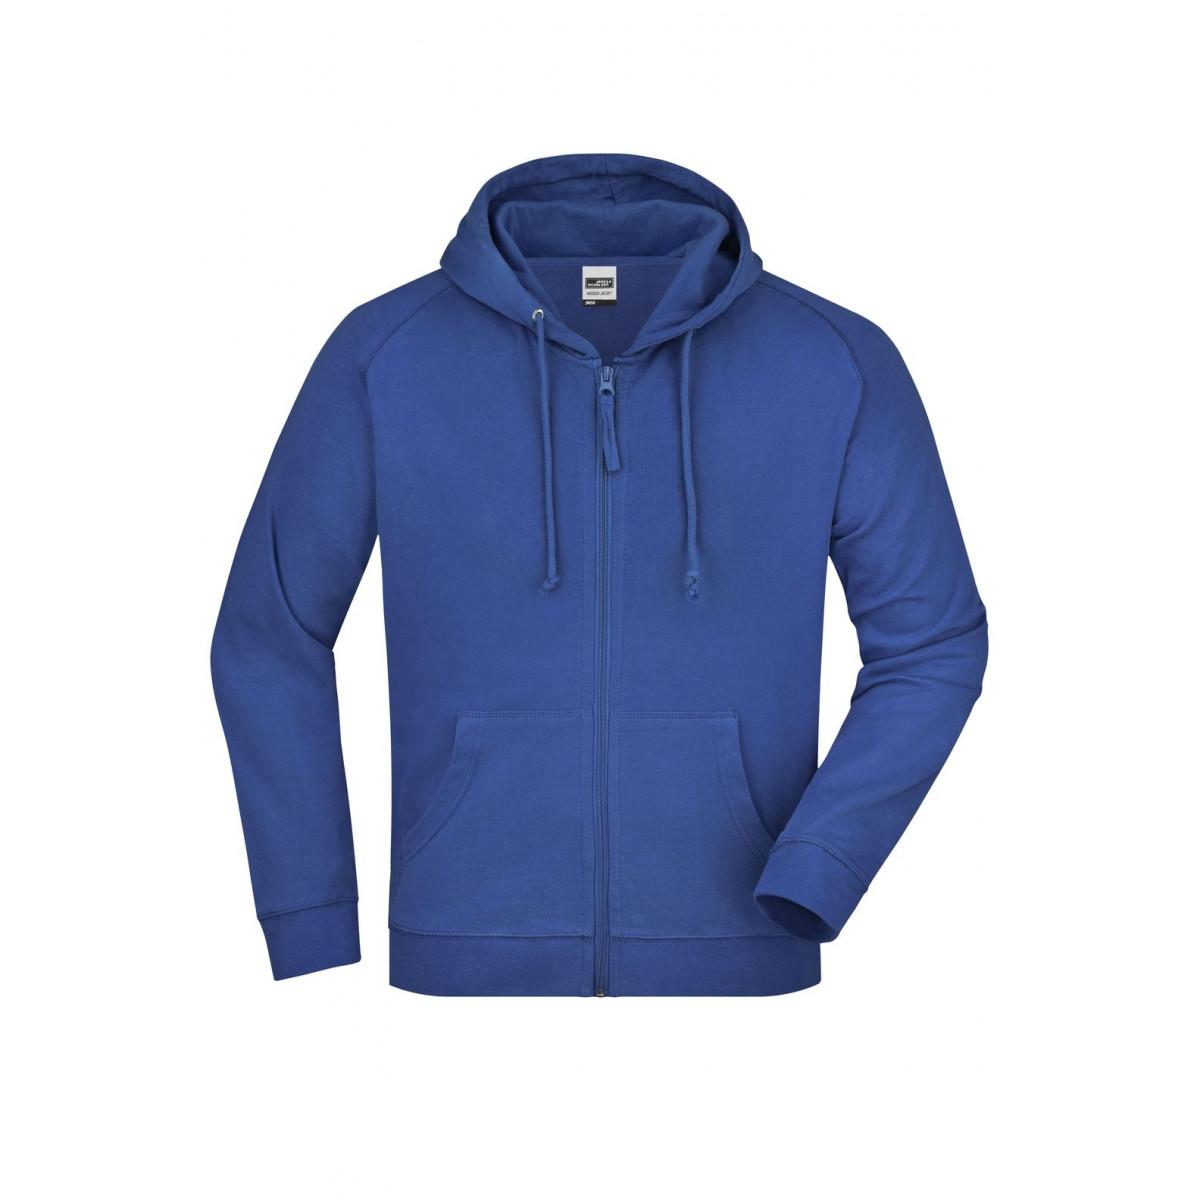 Толстовка мужская JN059 Hooded Jacket - Ярко-синий